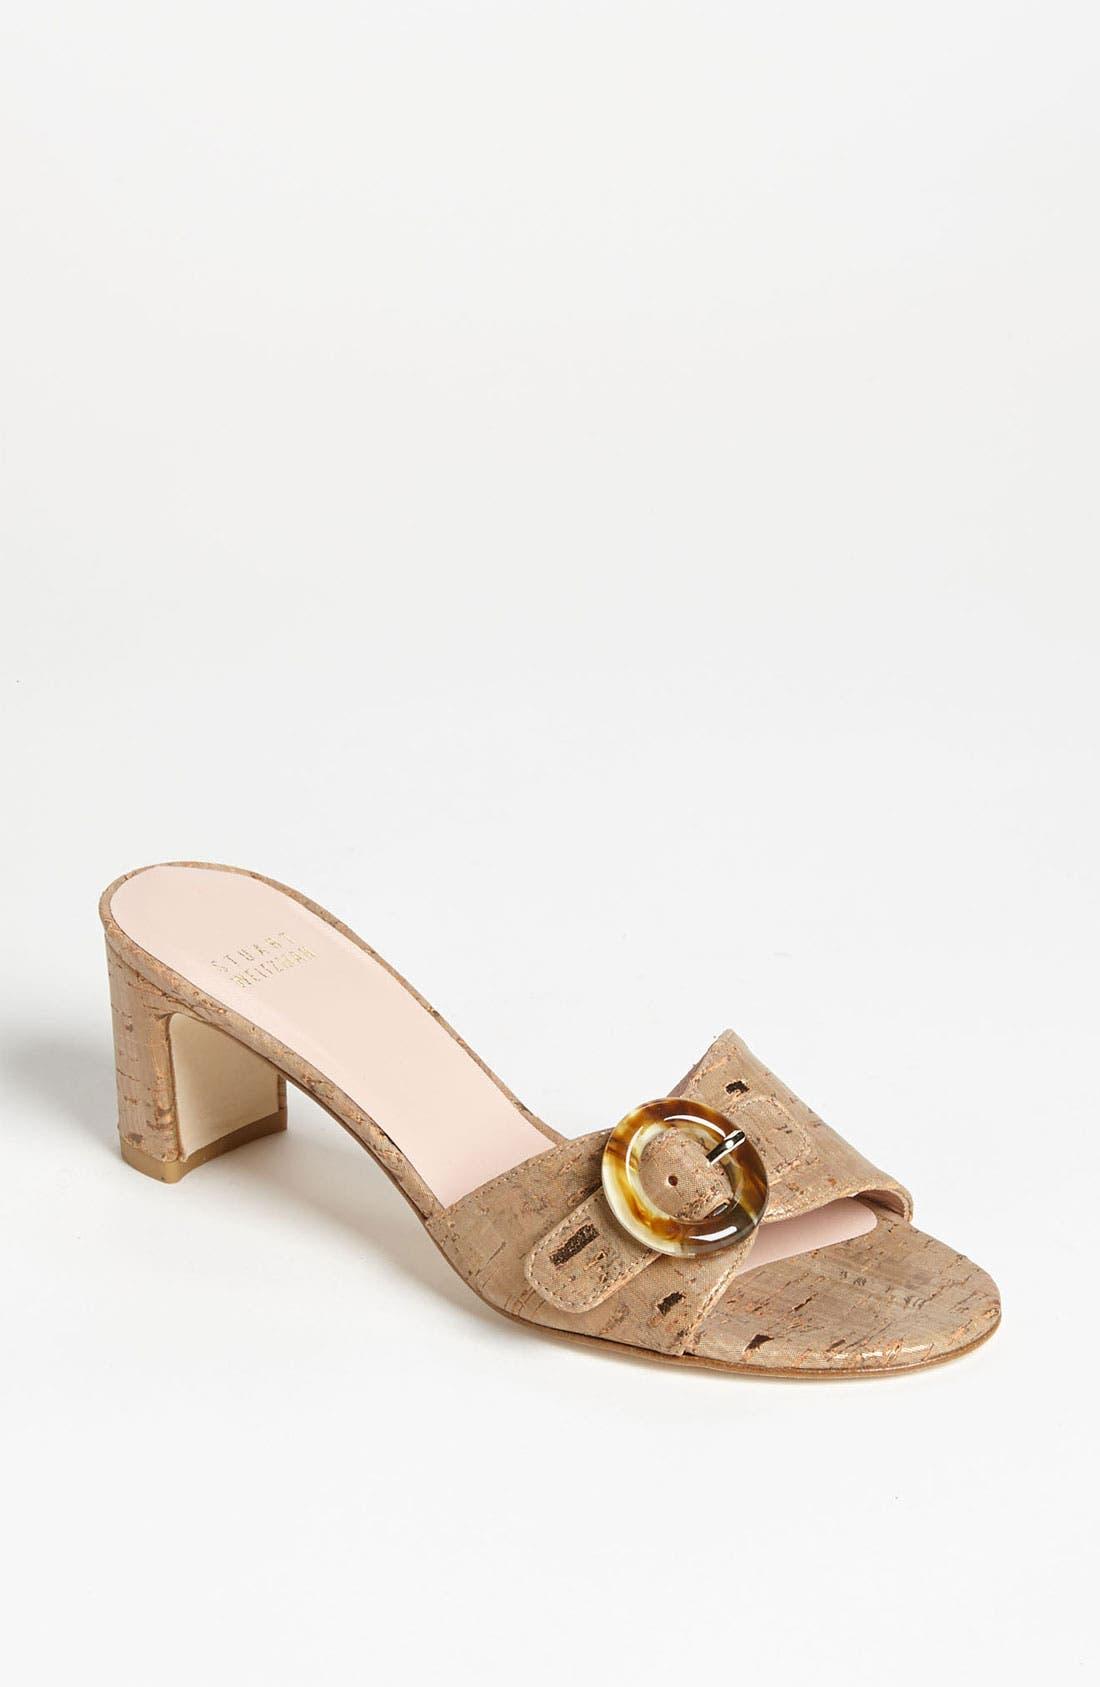 Main Image - Stuart Weitzman 'Bucat' Sandal